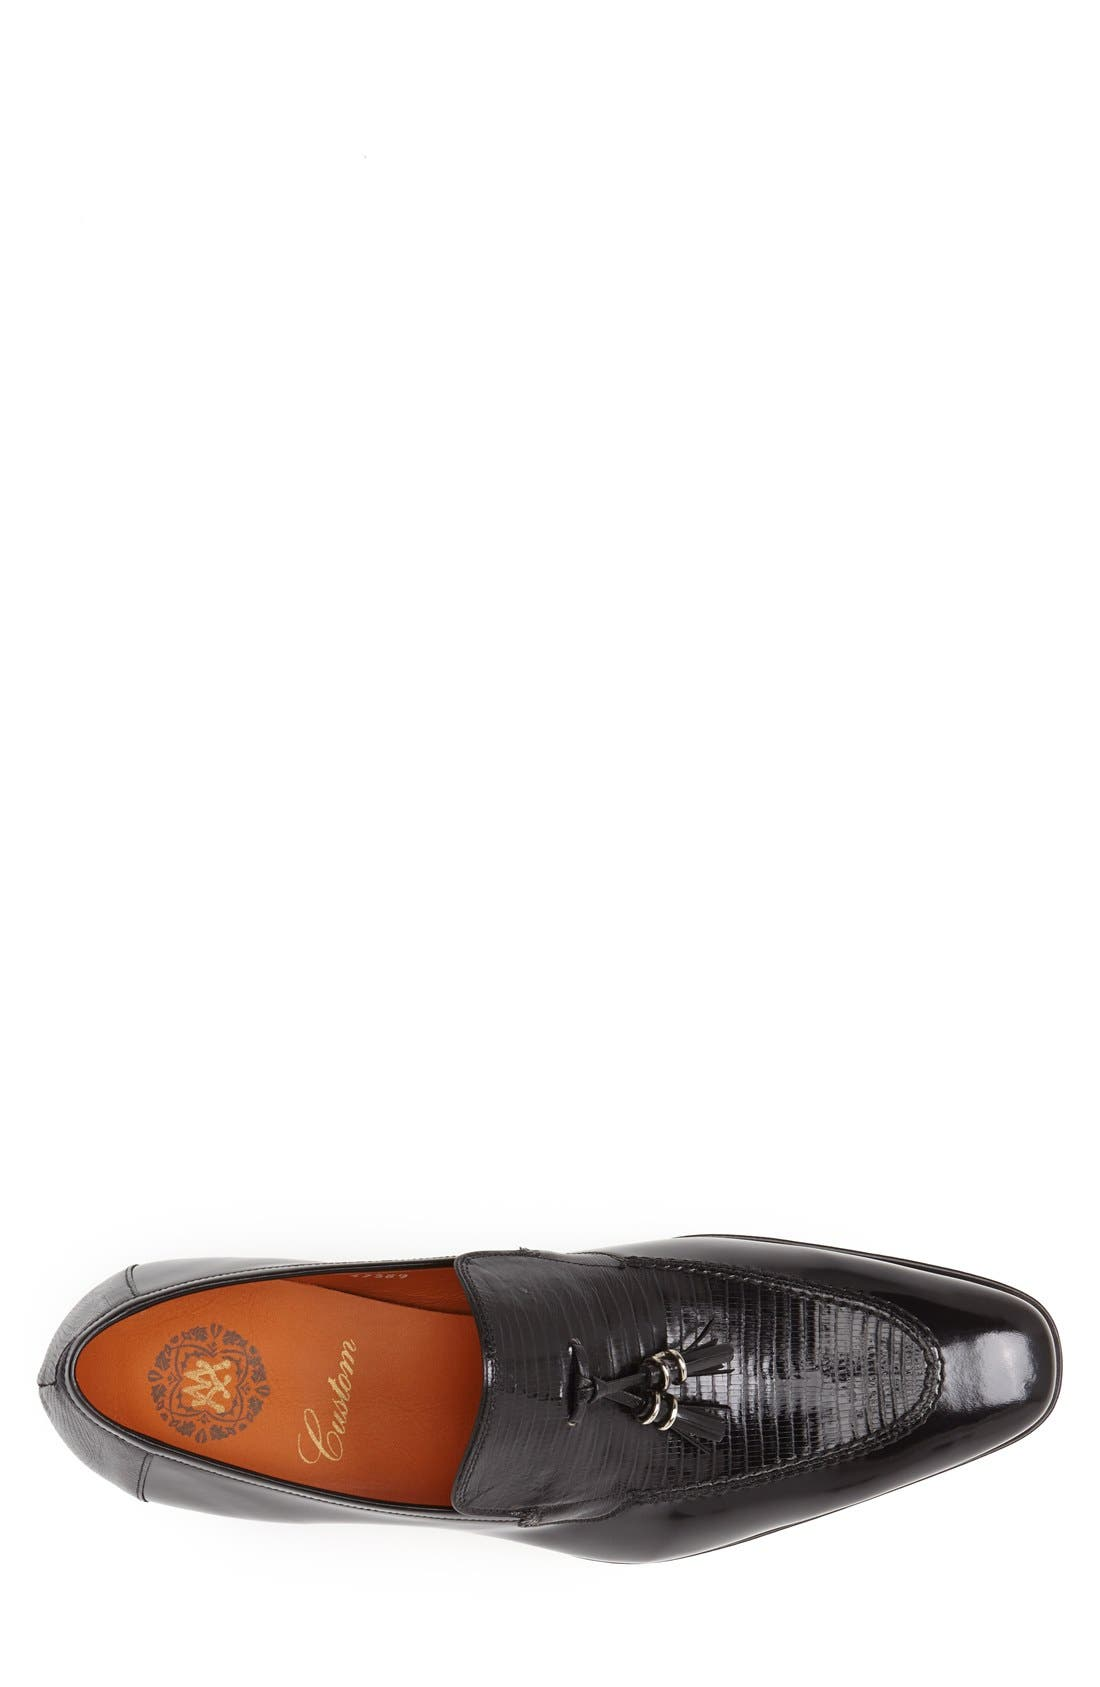 Alternate Image 3  - Mezlan 'Obrador' Lizard Leather Tassel Loafer (Men)